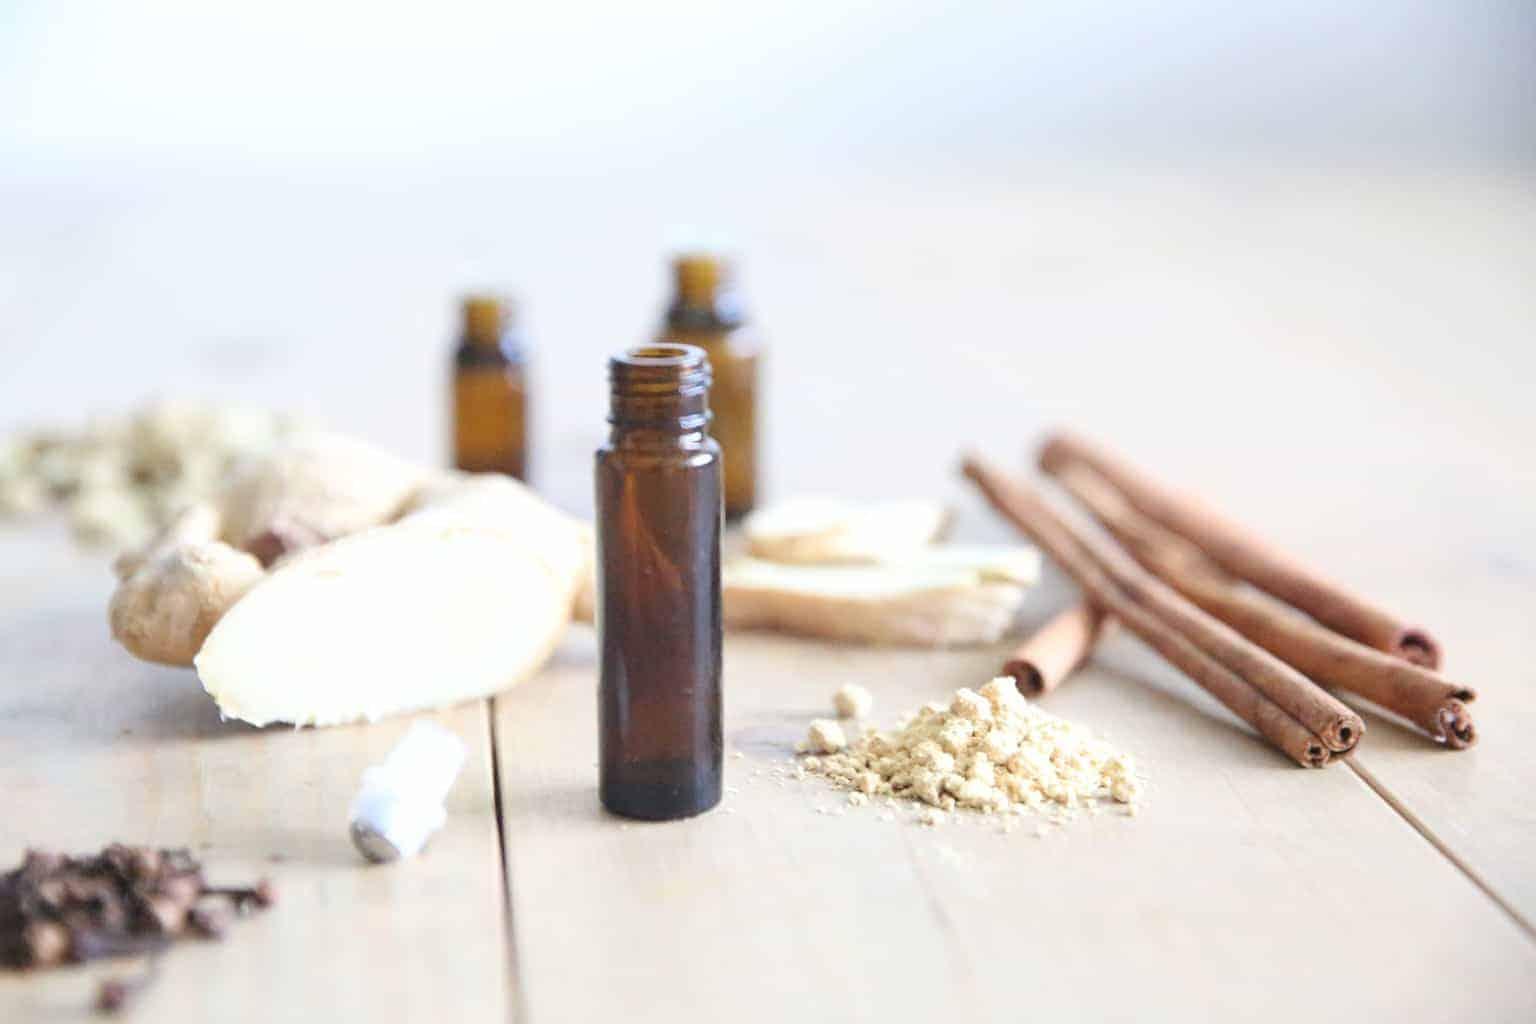 ginger essential oil highlight roller bottles diffuser blends natural remedies home solutions diy healthy kids fall roller bottles